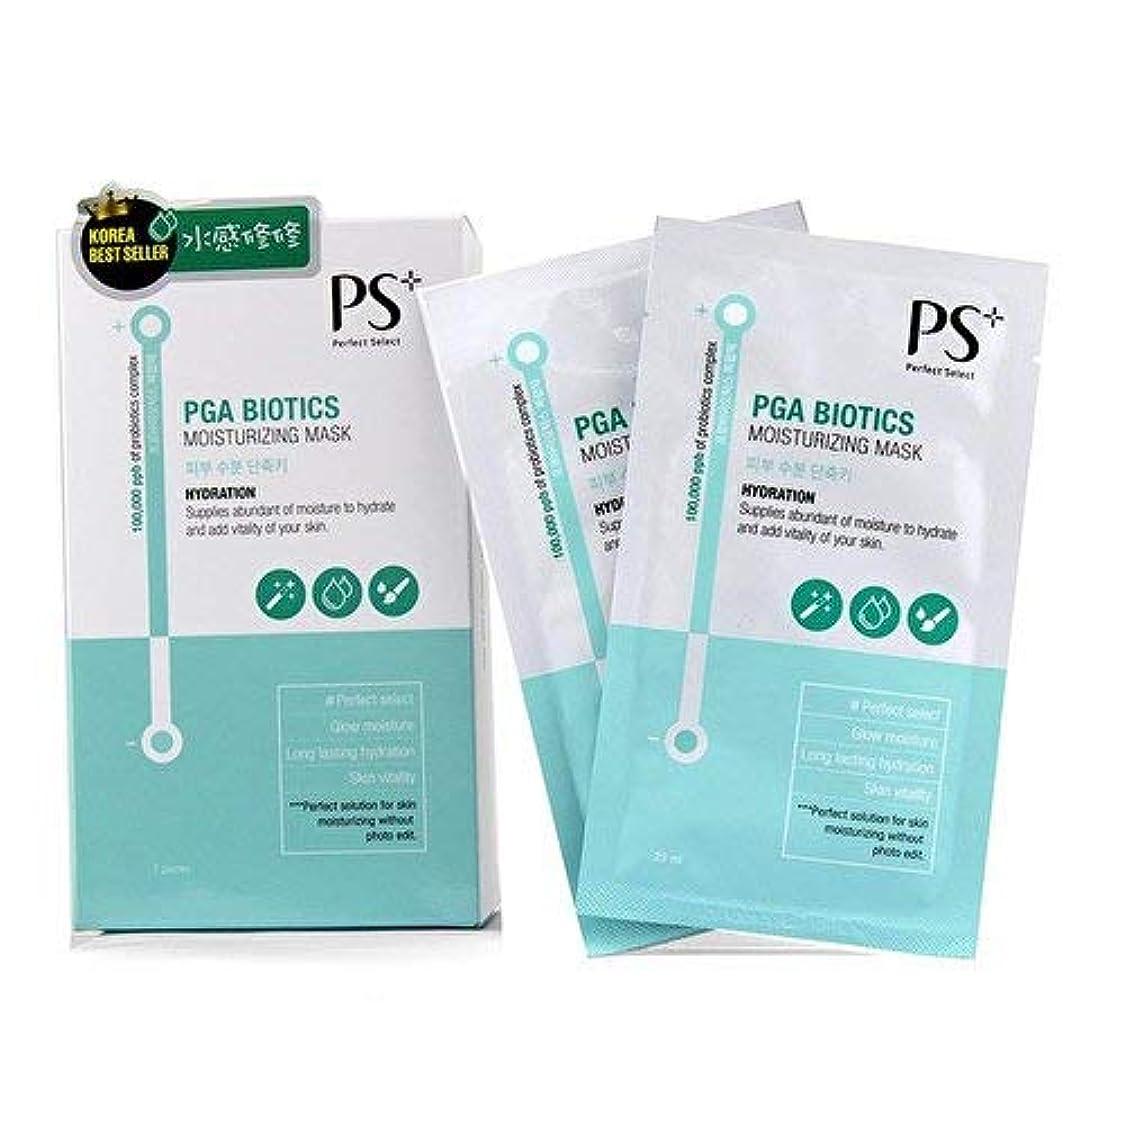 PS Perfect Select PGA Biotics Moisturizing Mask - Hydration 7pcs並行輸入品